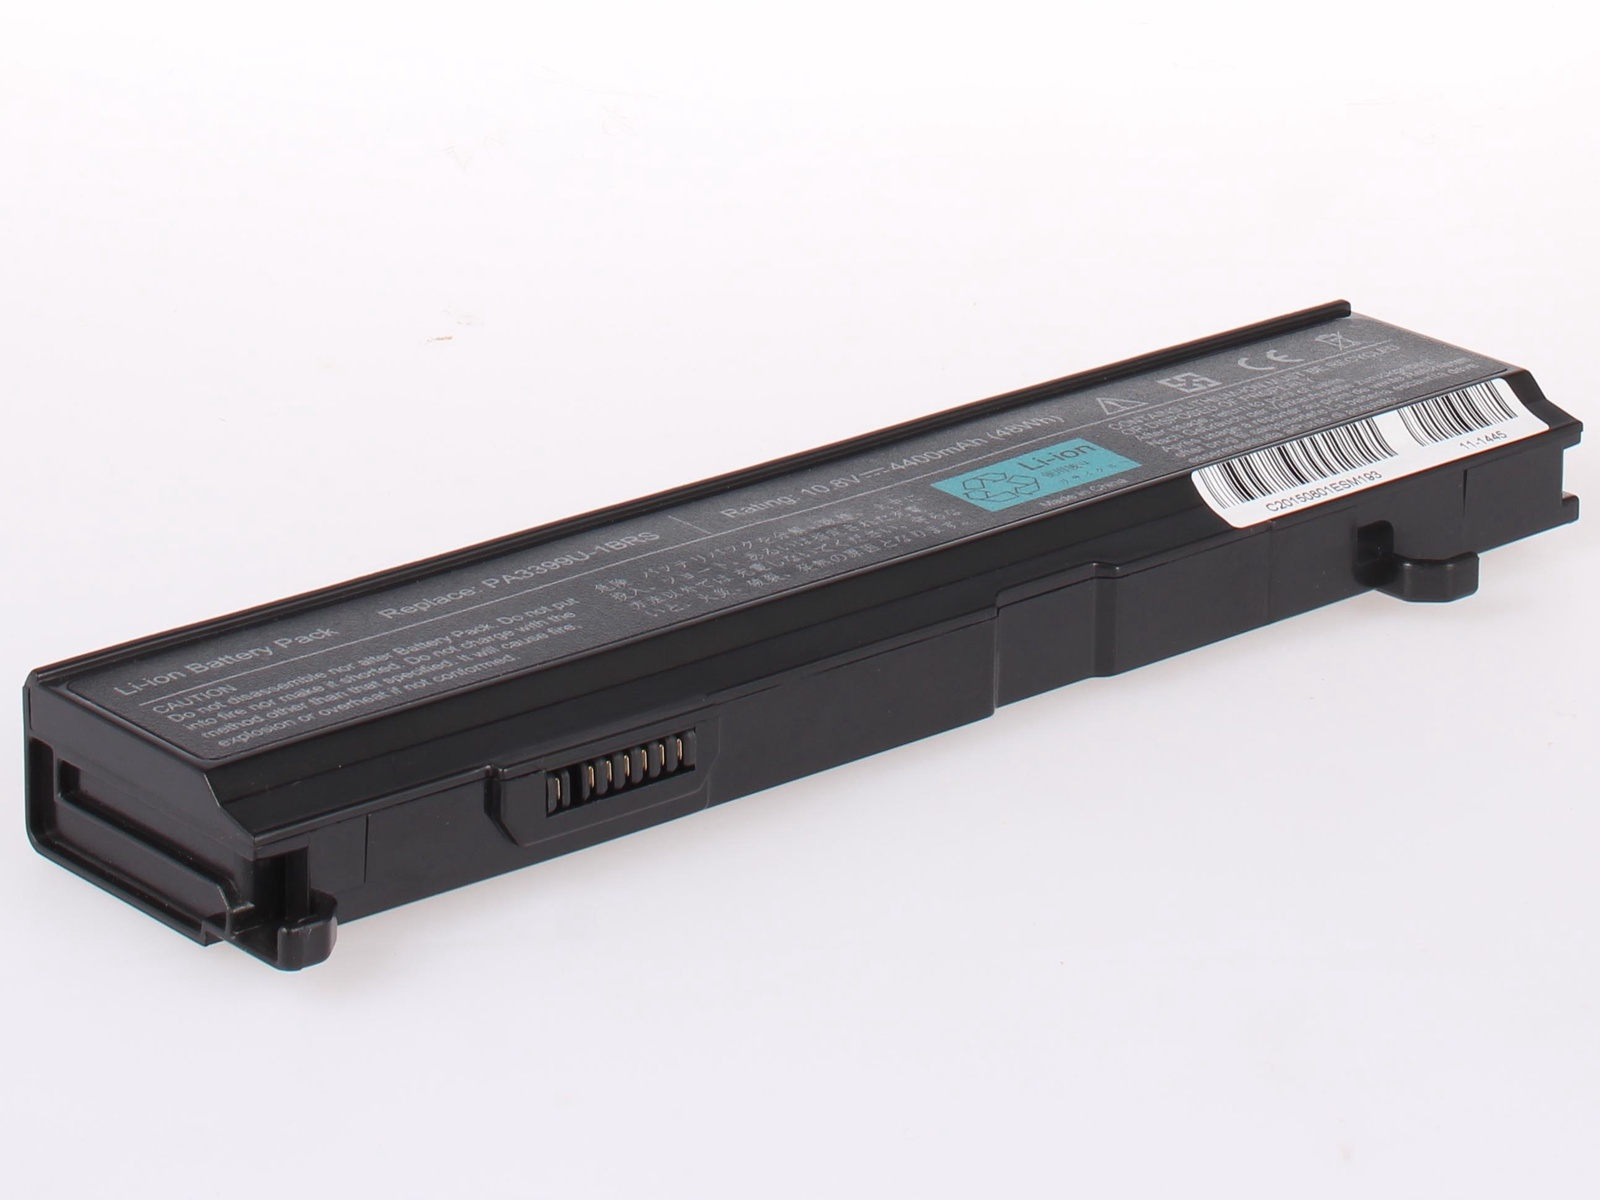 Аккумулятор для ноутбука AnyBatt для ToshiBa Satellite M40-183, Tecra A3, Satellite A110-178, Satellite M45-S359, Satellite Pro A100, Tecra A7, Satellite A100-002, Satellite A105-S4064, Satellite A100-334, Satellite M45-S331 цена